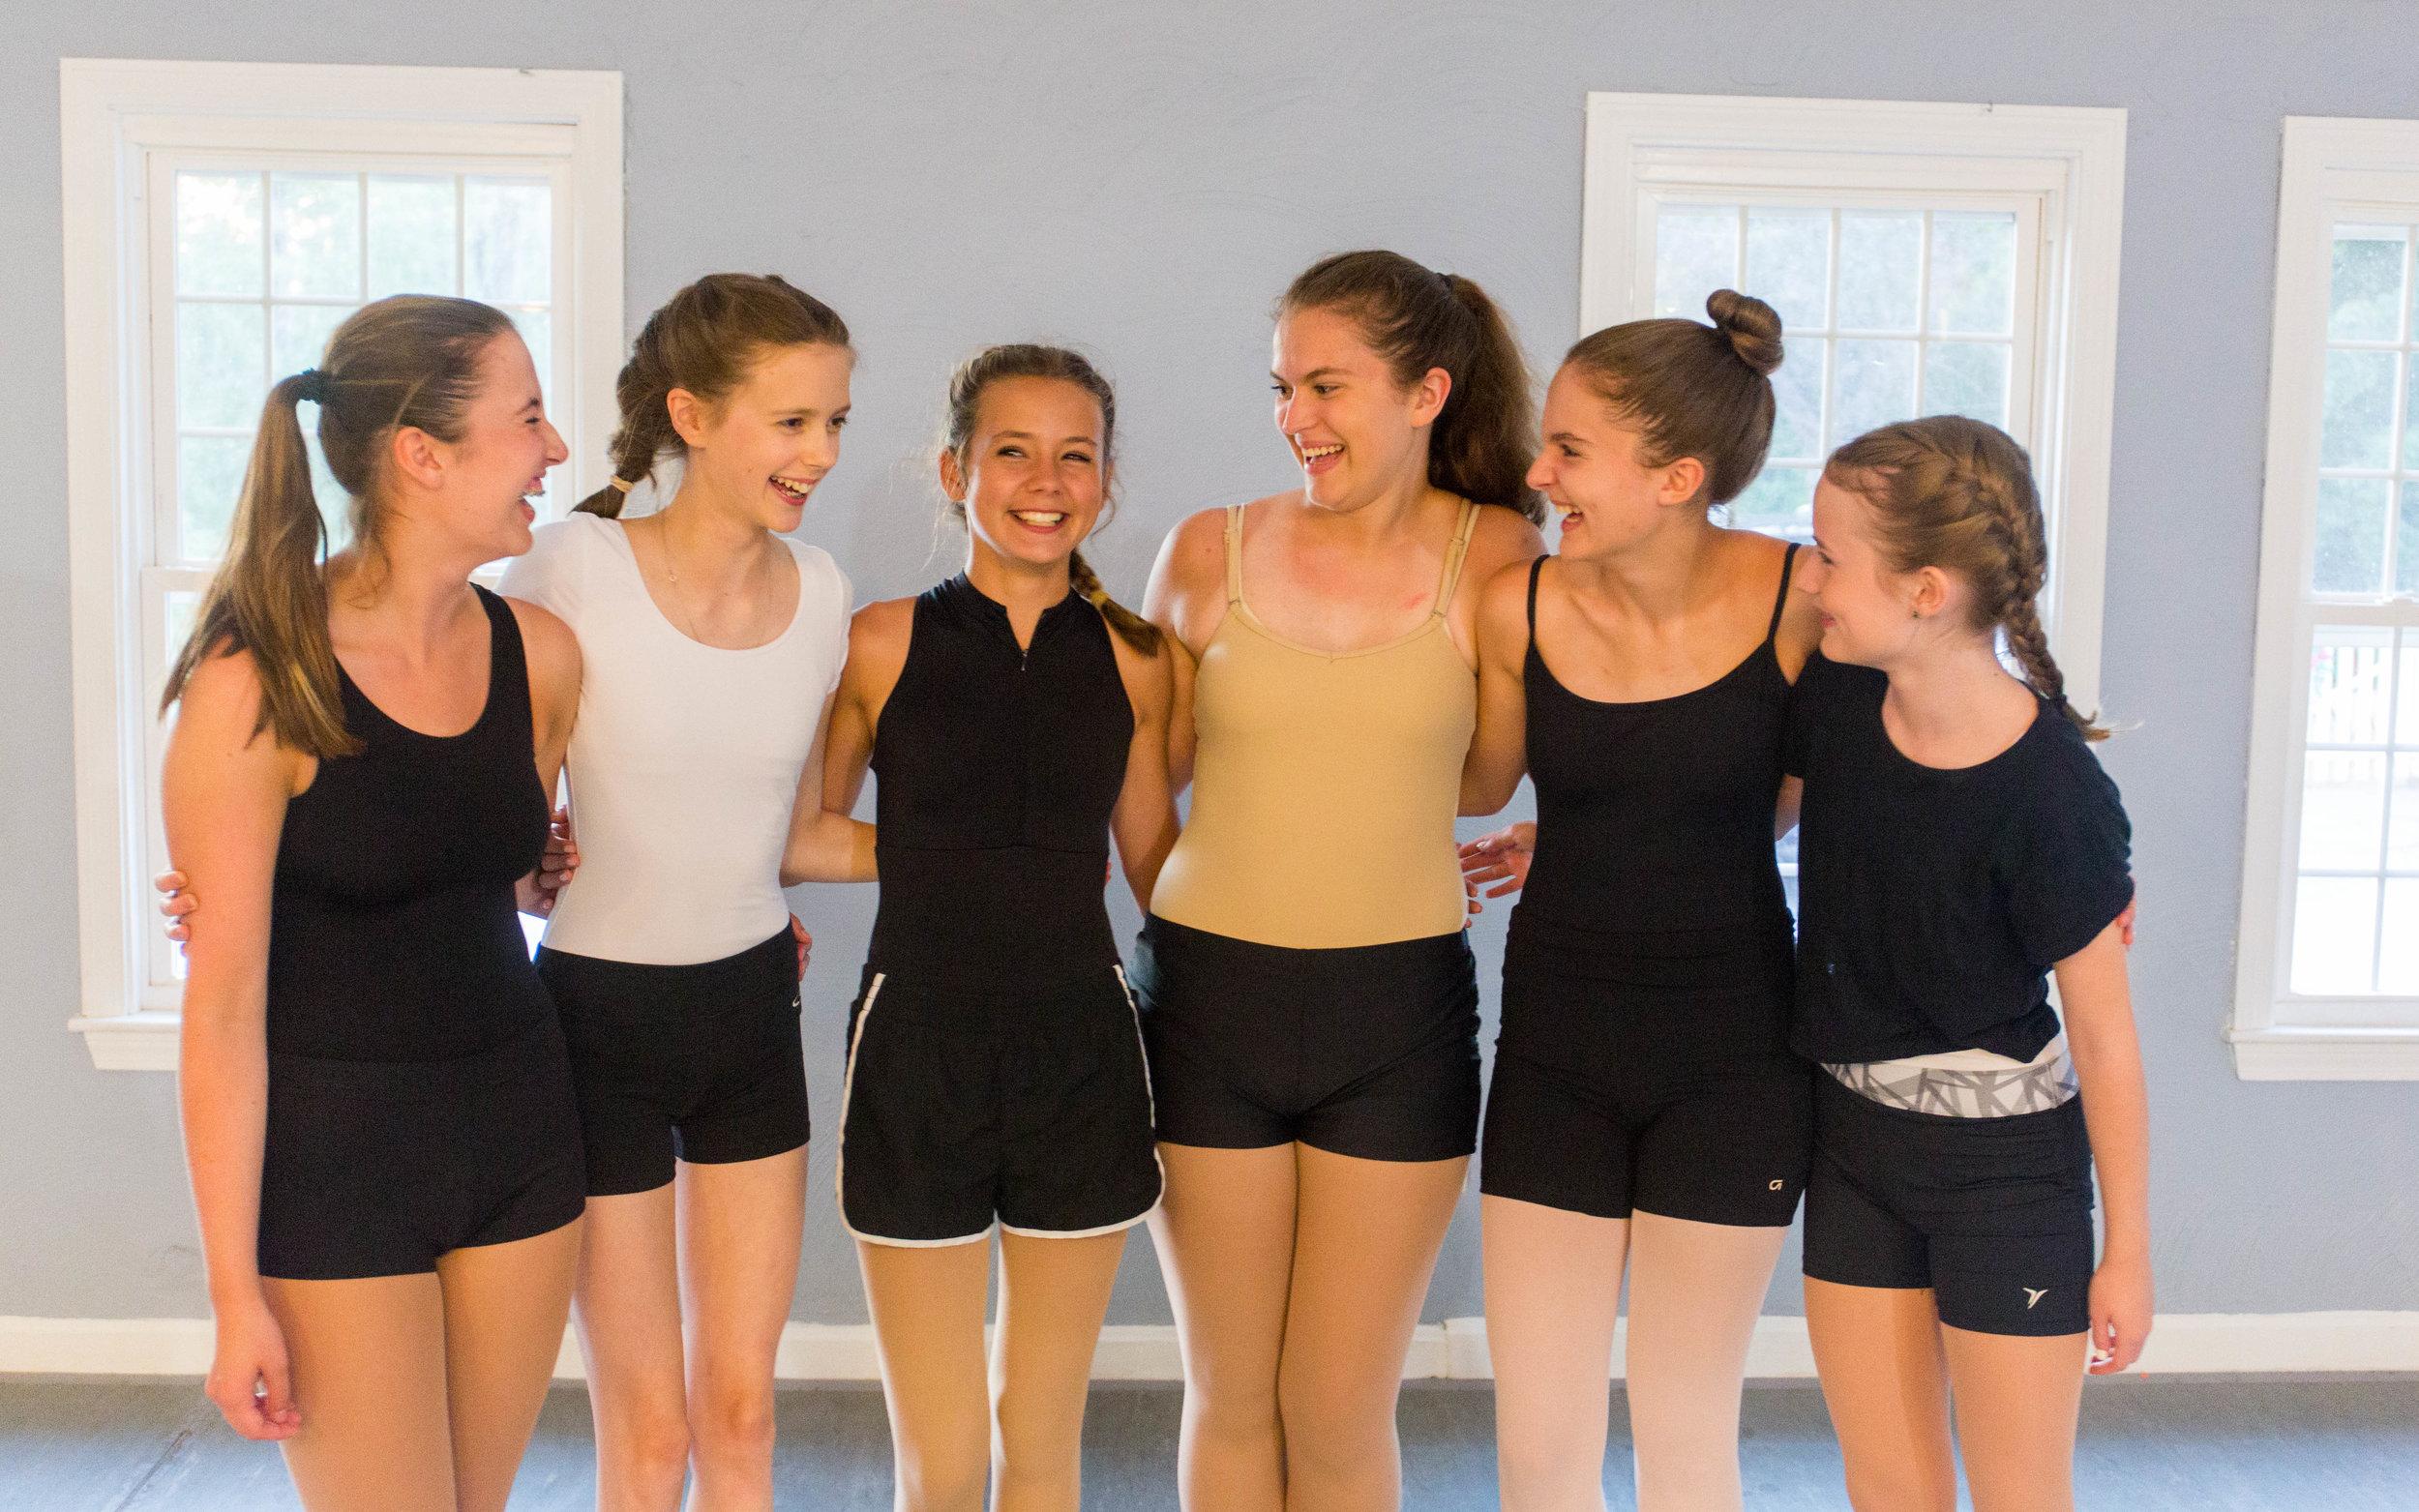 DancersGroup.jpg